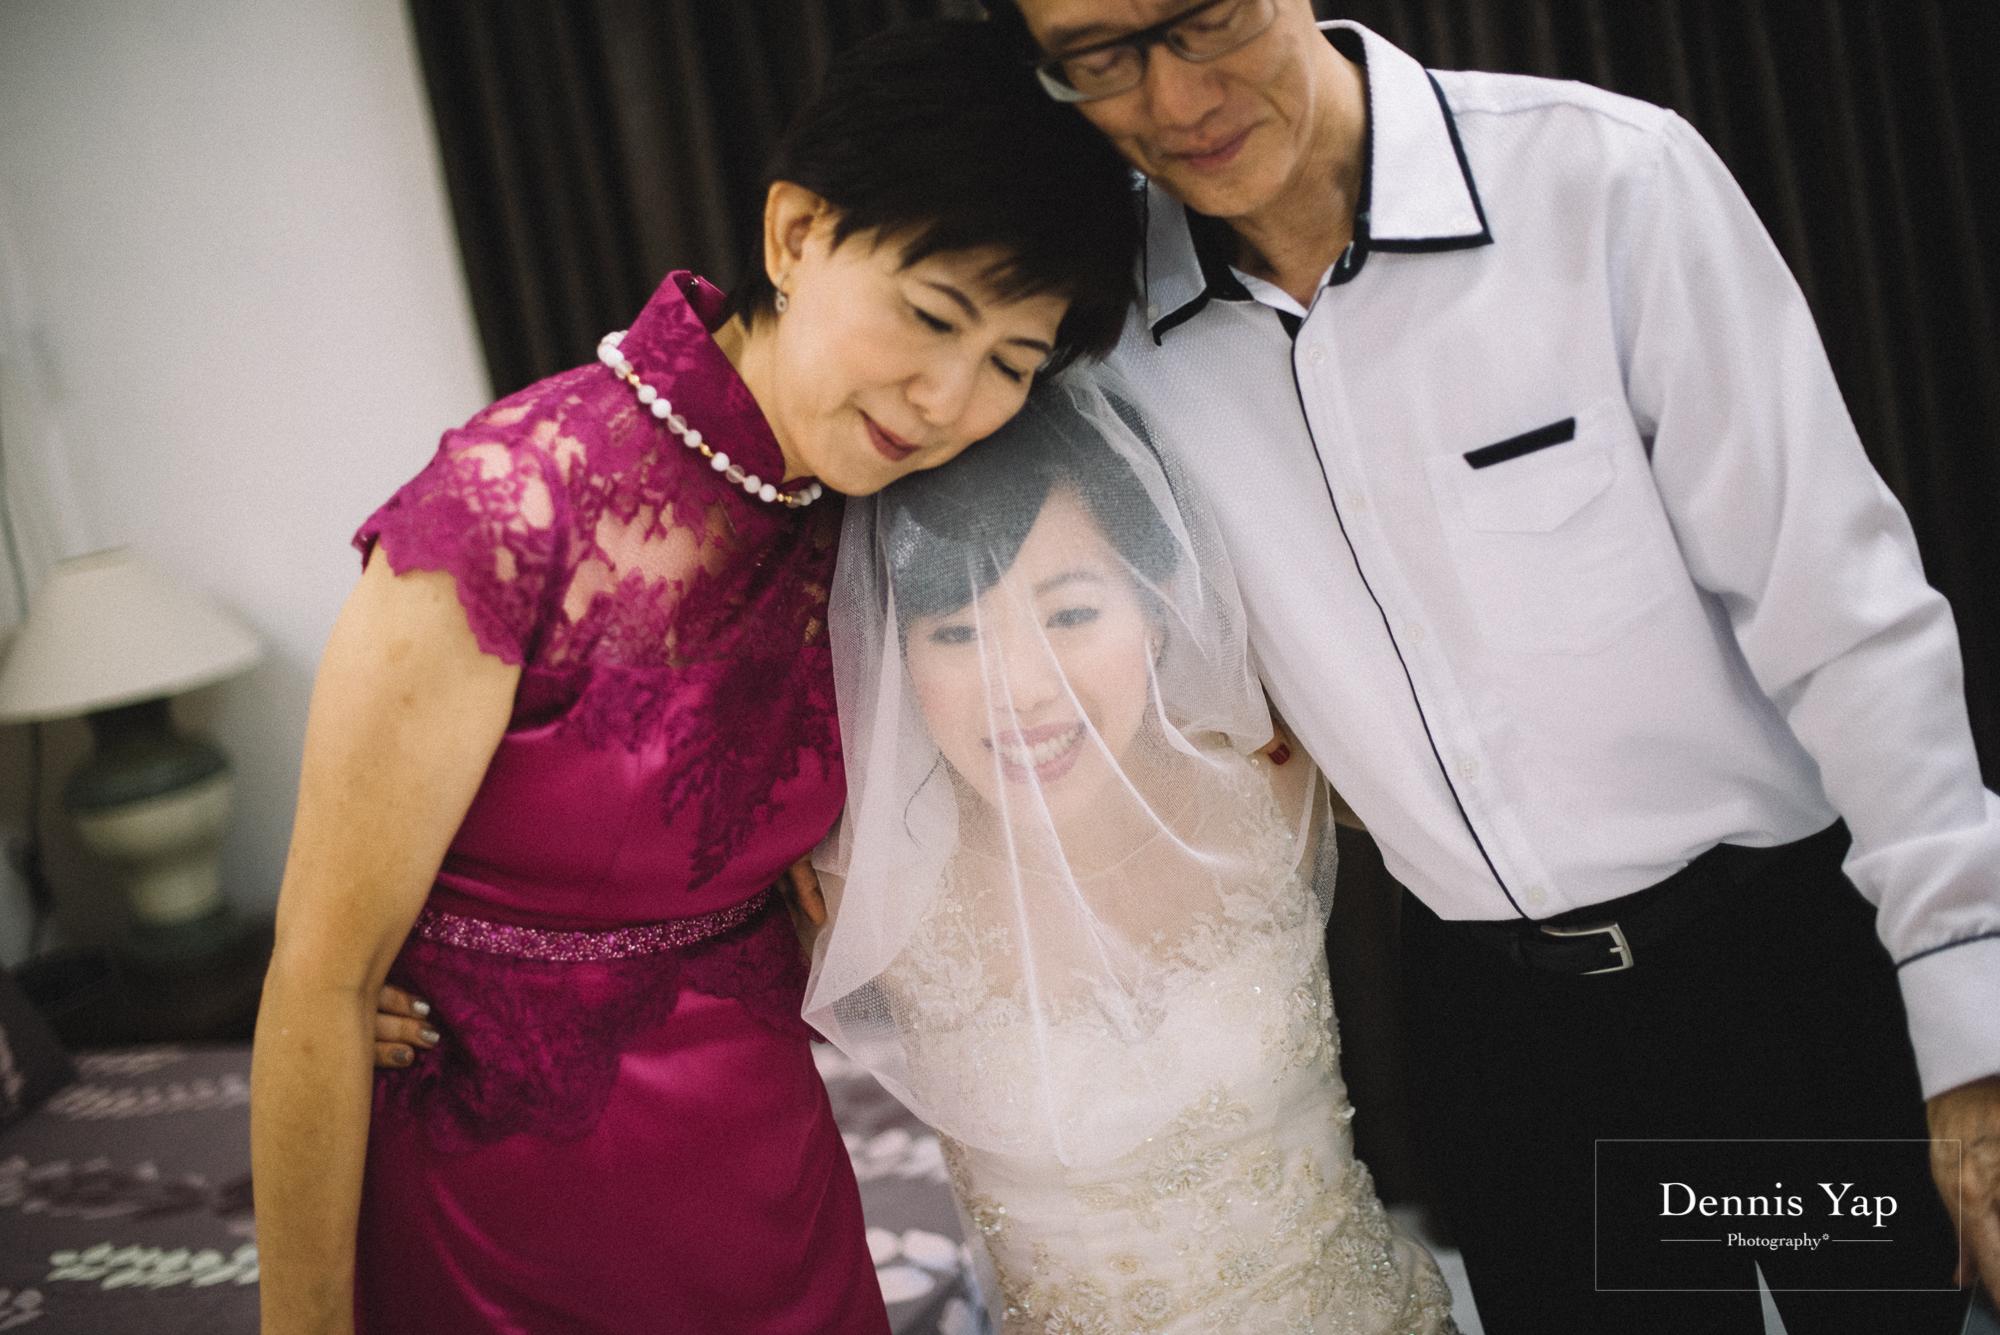 alex shir ley wedding day gate crash subang jaya usj dennis yap photography moments-2.jpg